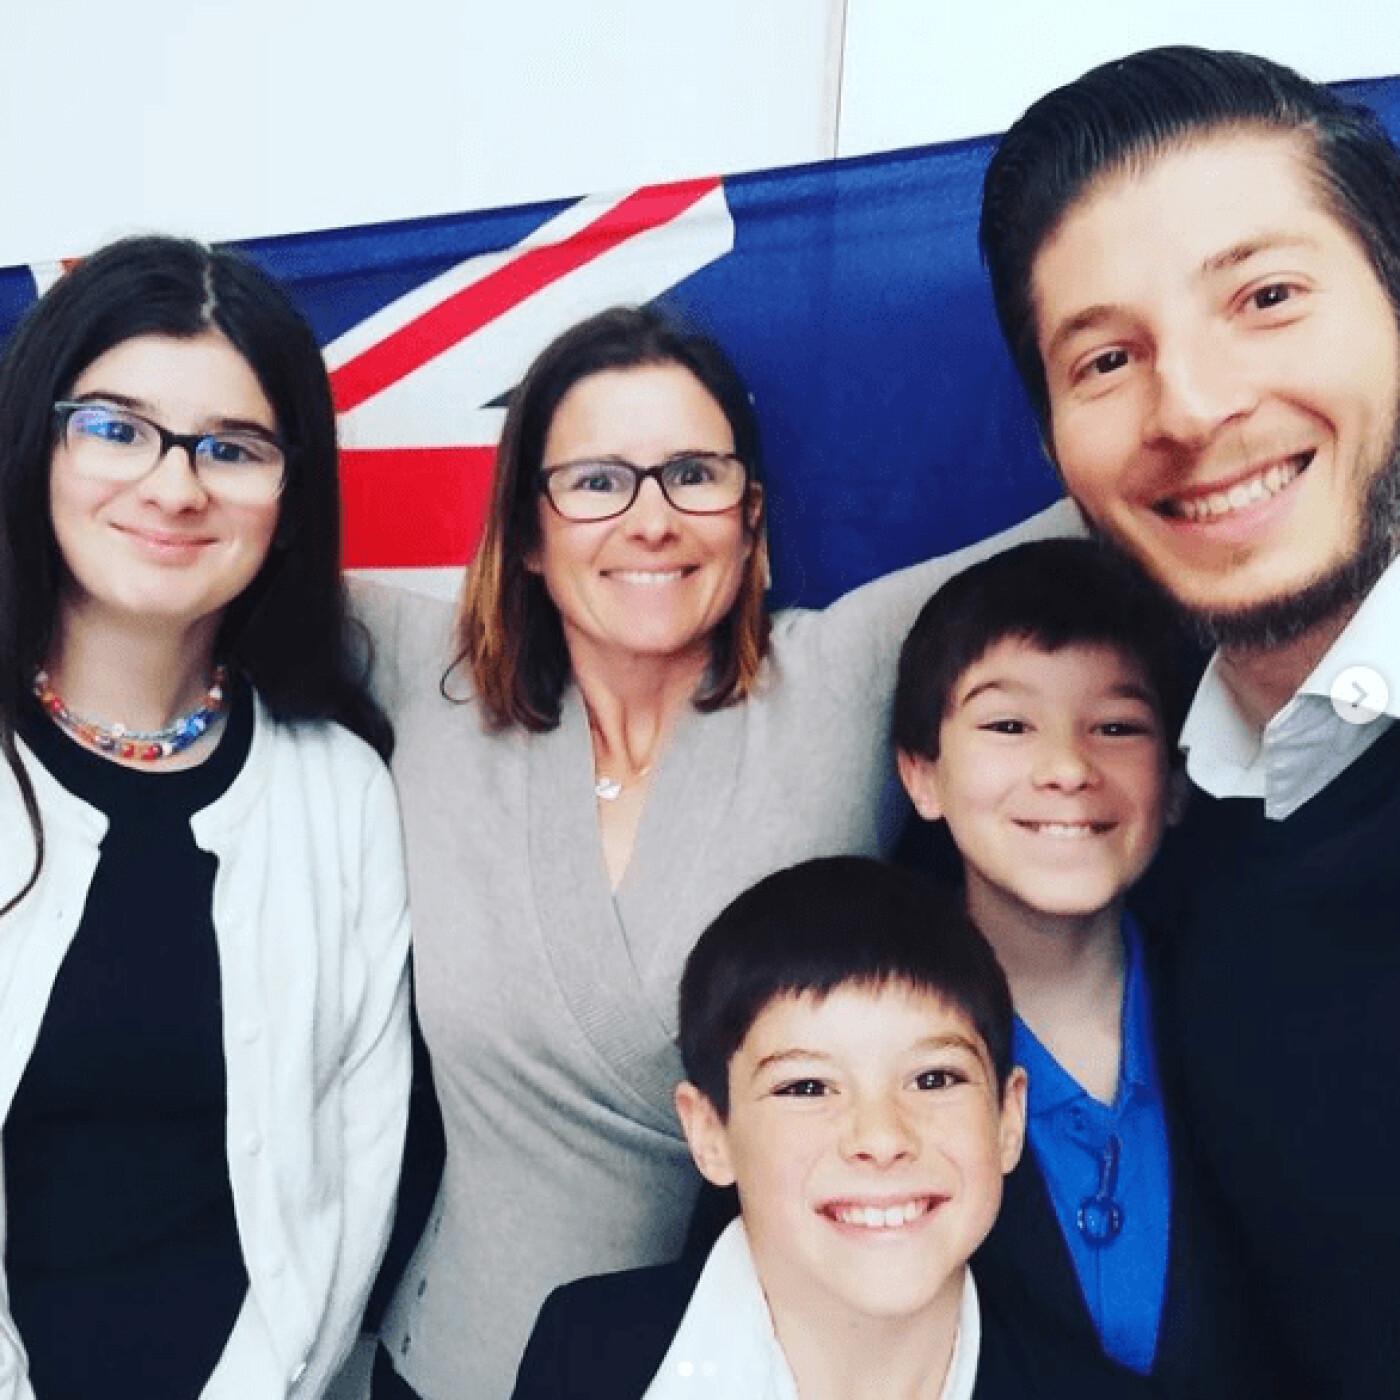 Sandrine s'est installée en Australie en famille il y a 6 ans - 05 10 2021 - StereoChic Radio